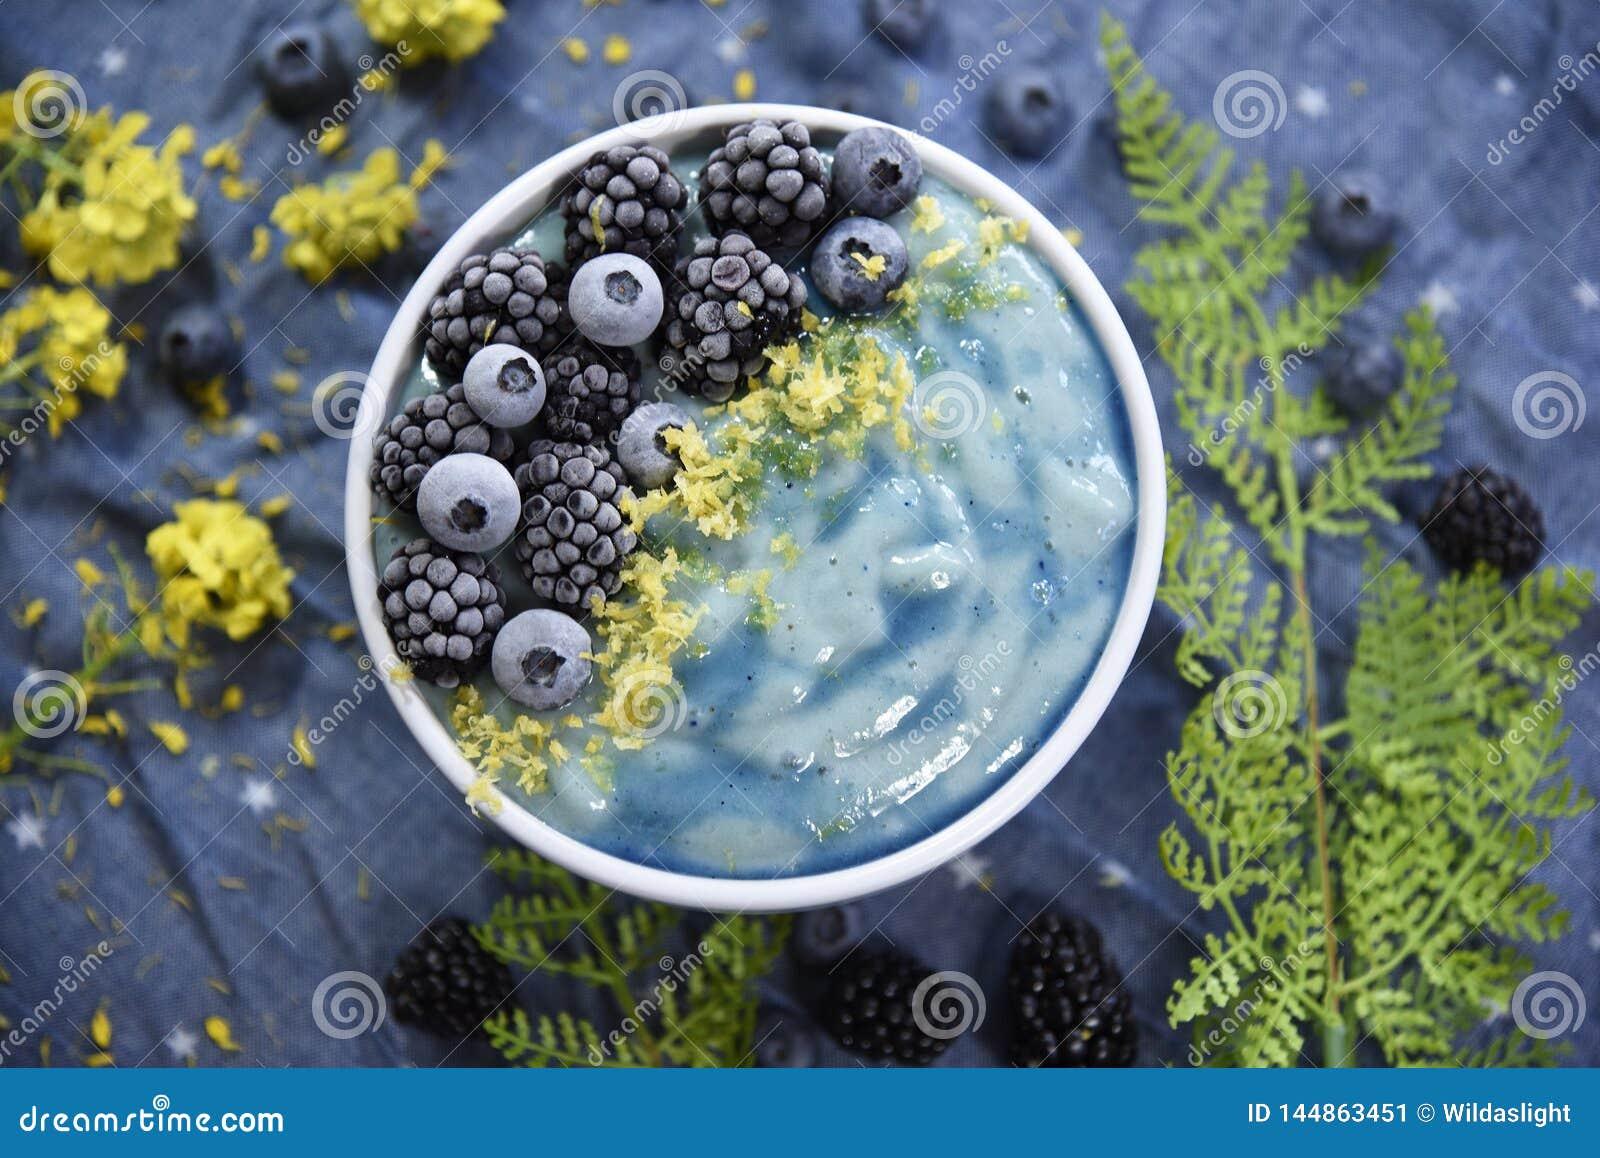 Ljus blå Superfood Smoothiebunke